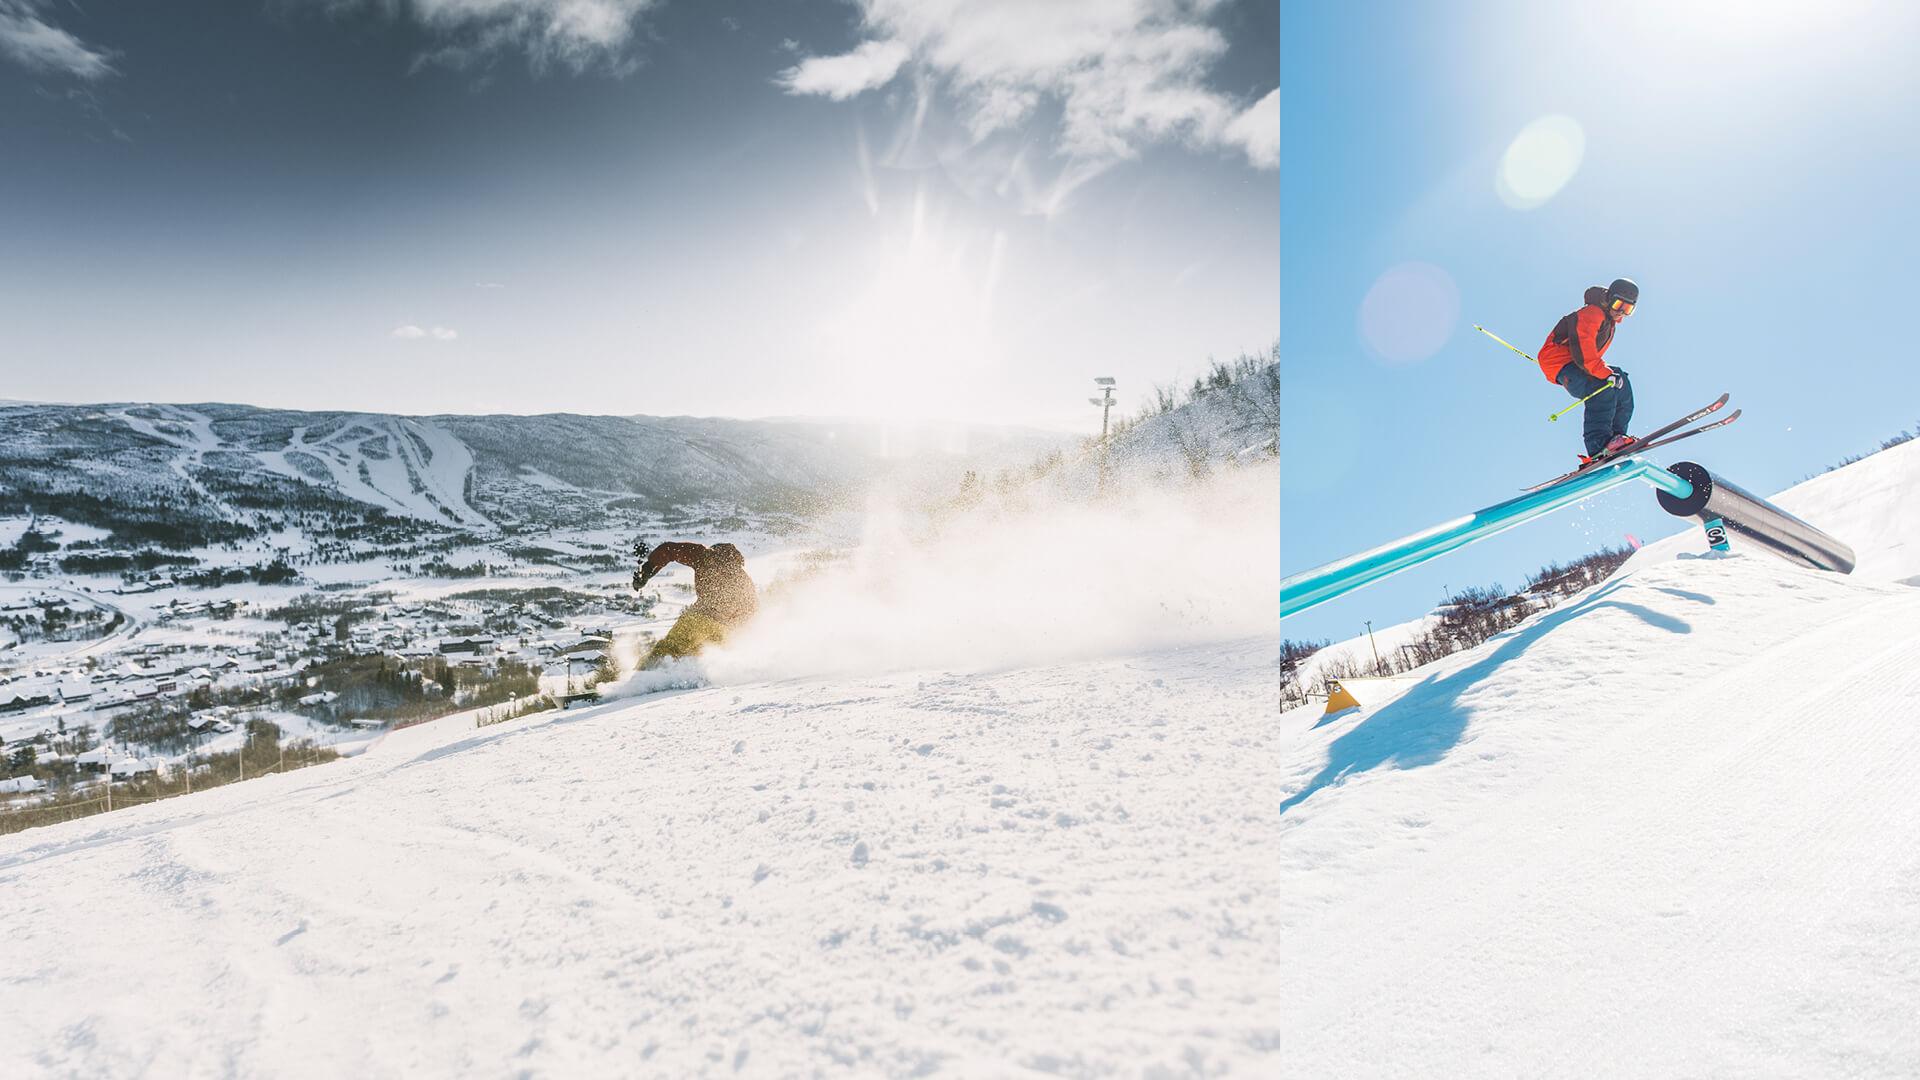 Yvi Kikut vinteraktivitet - Alpint på Geilo